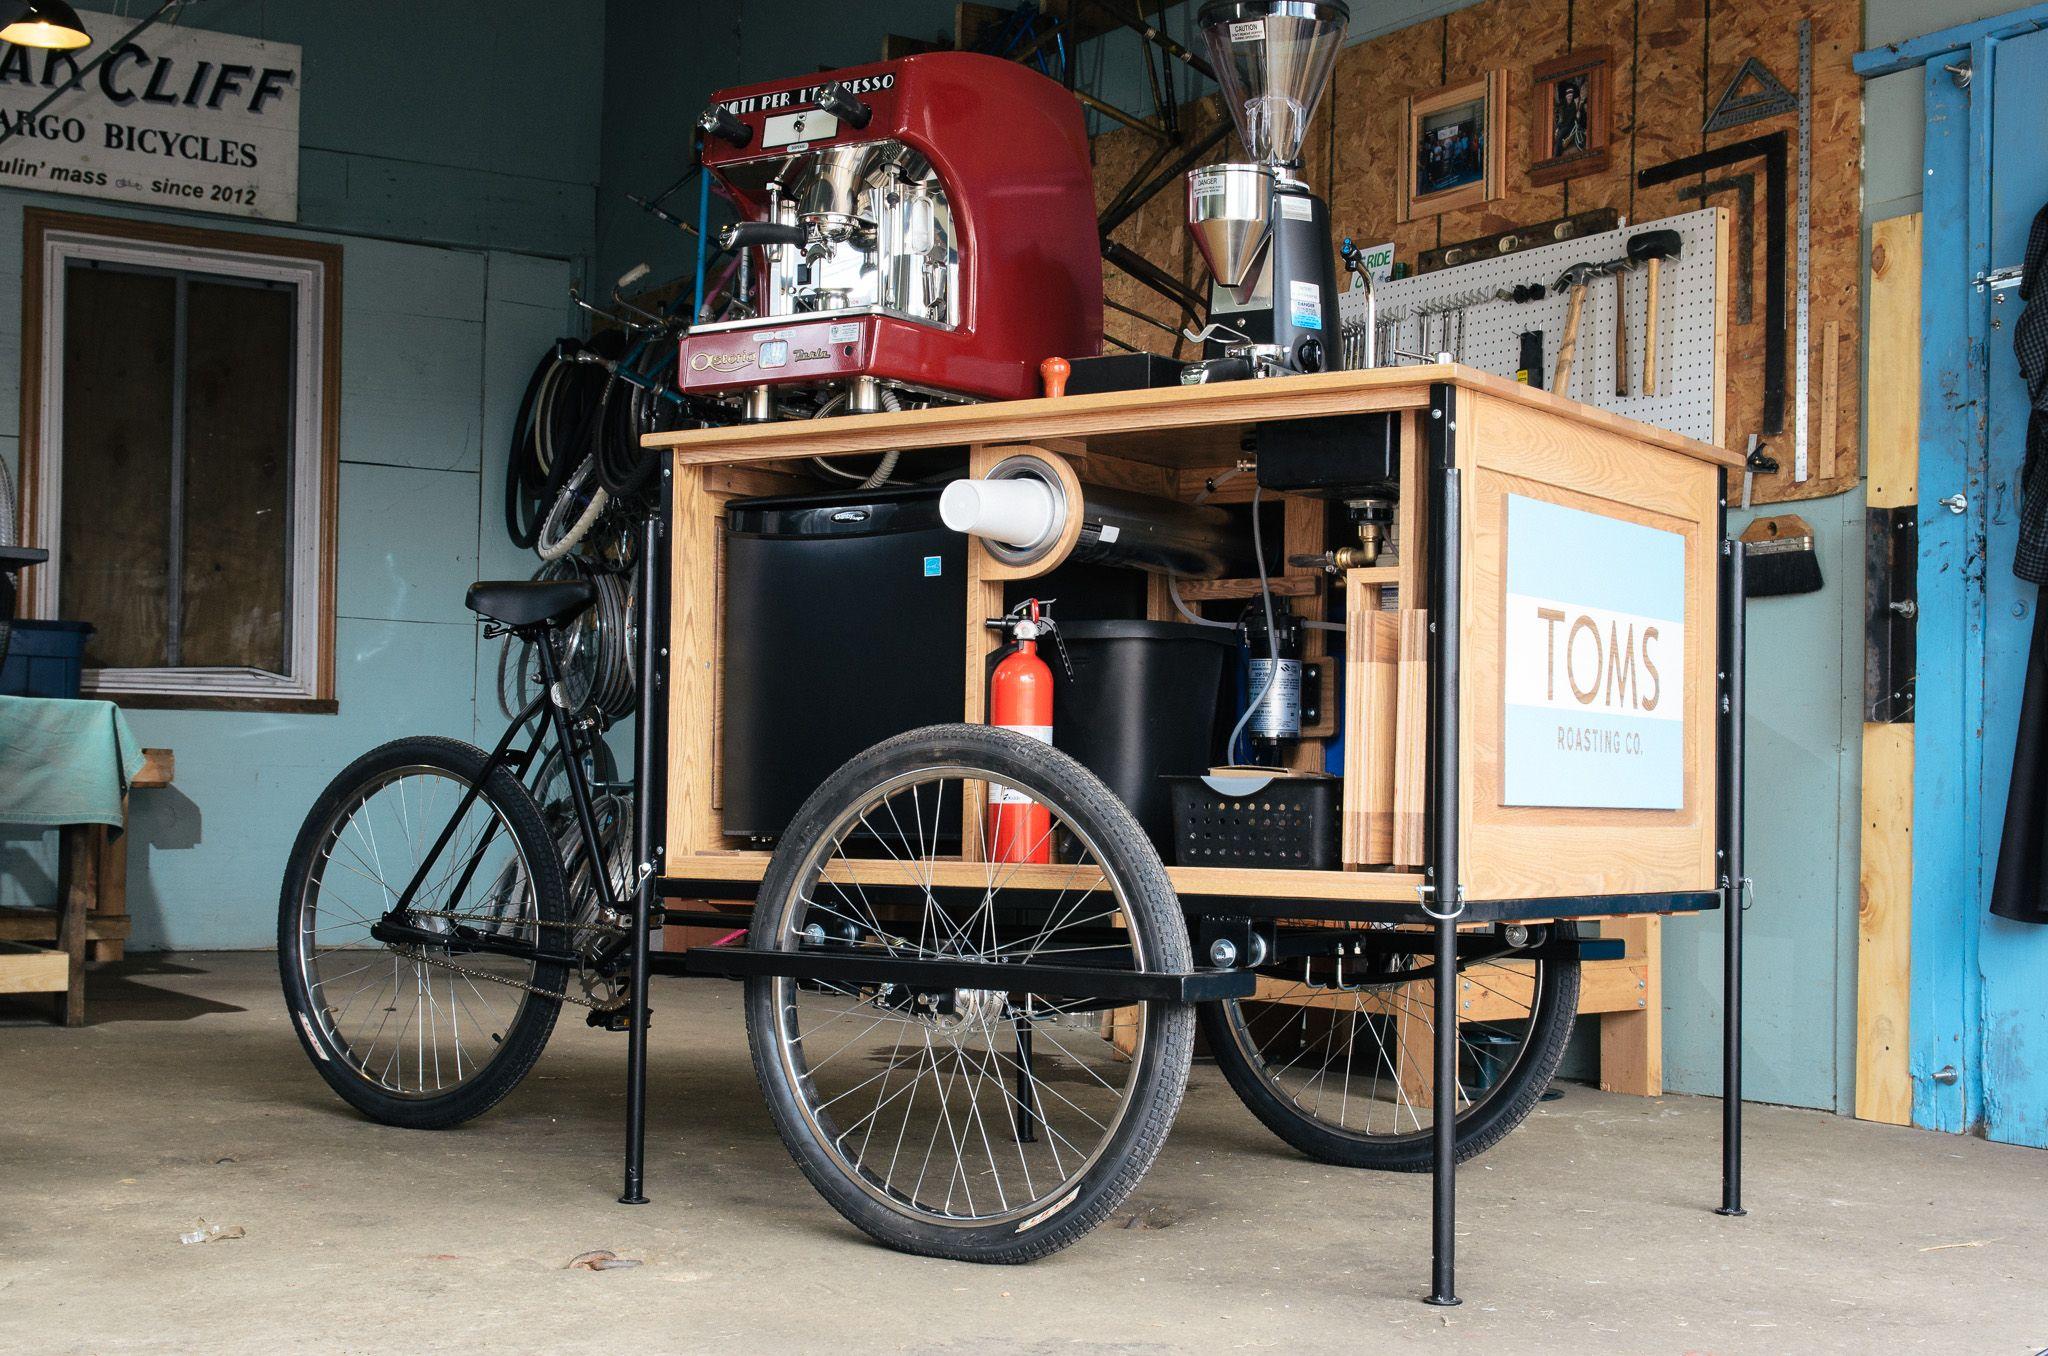 Oak Cliff Cargo Bicycles